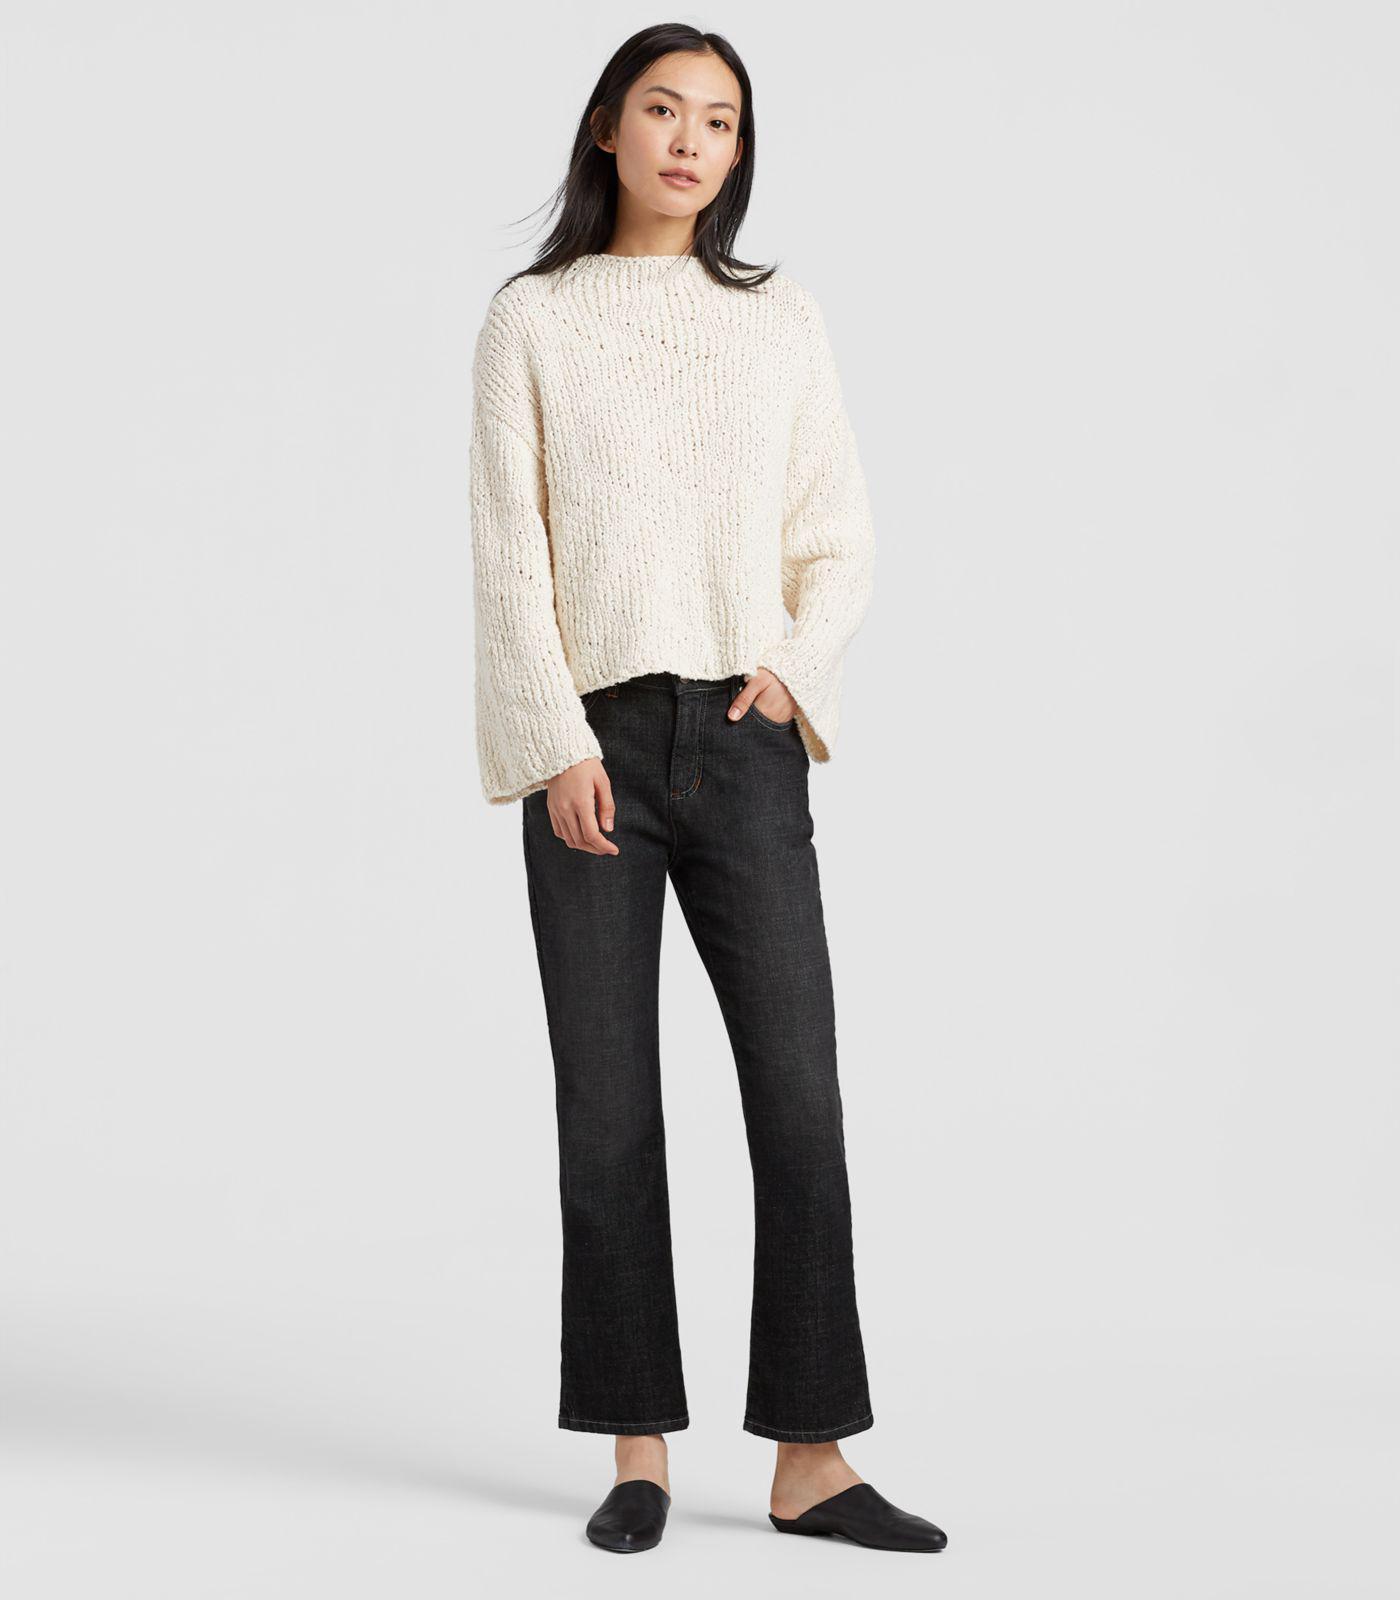 383632042d0209 Lyst - Eileen Fisher Peruvian Organic Cotton Funnel Neck Box-top in ...